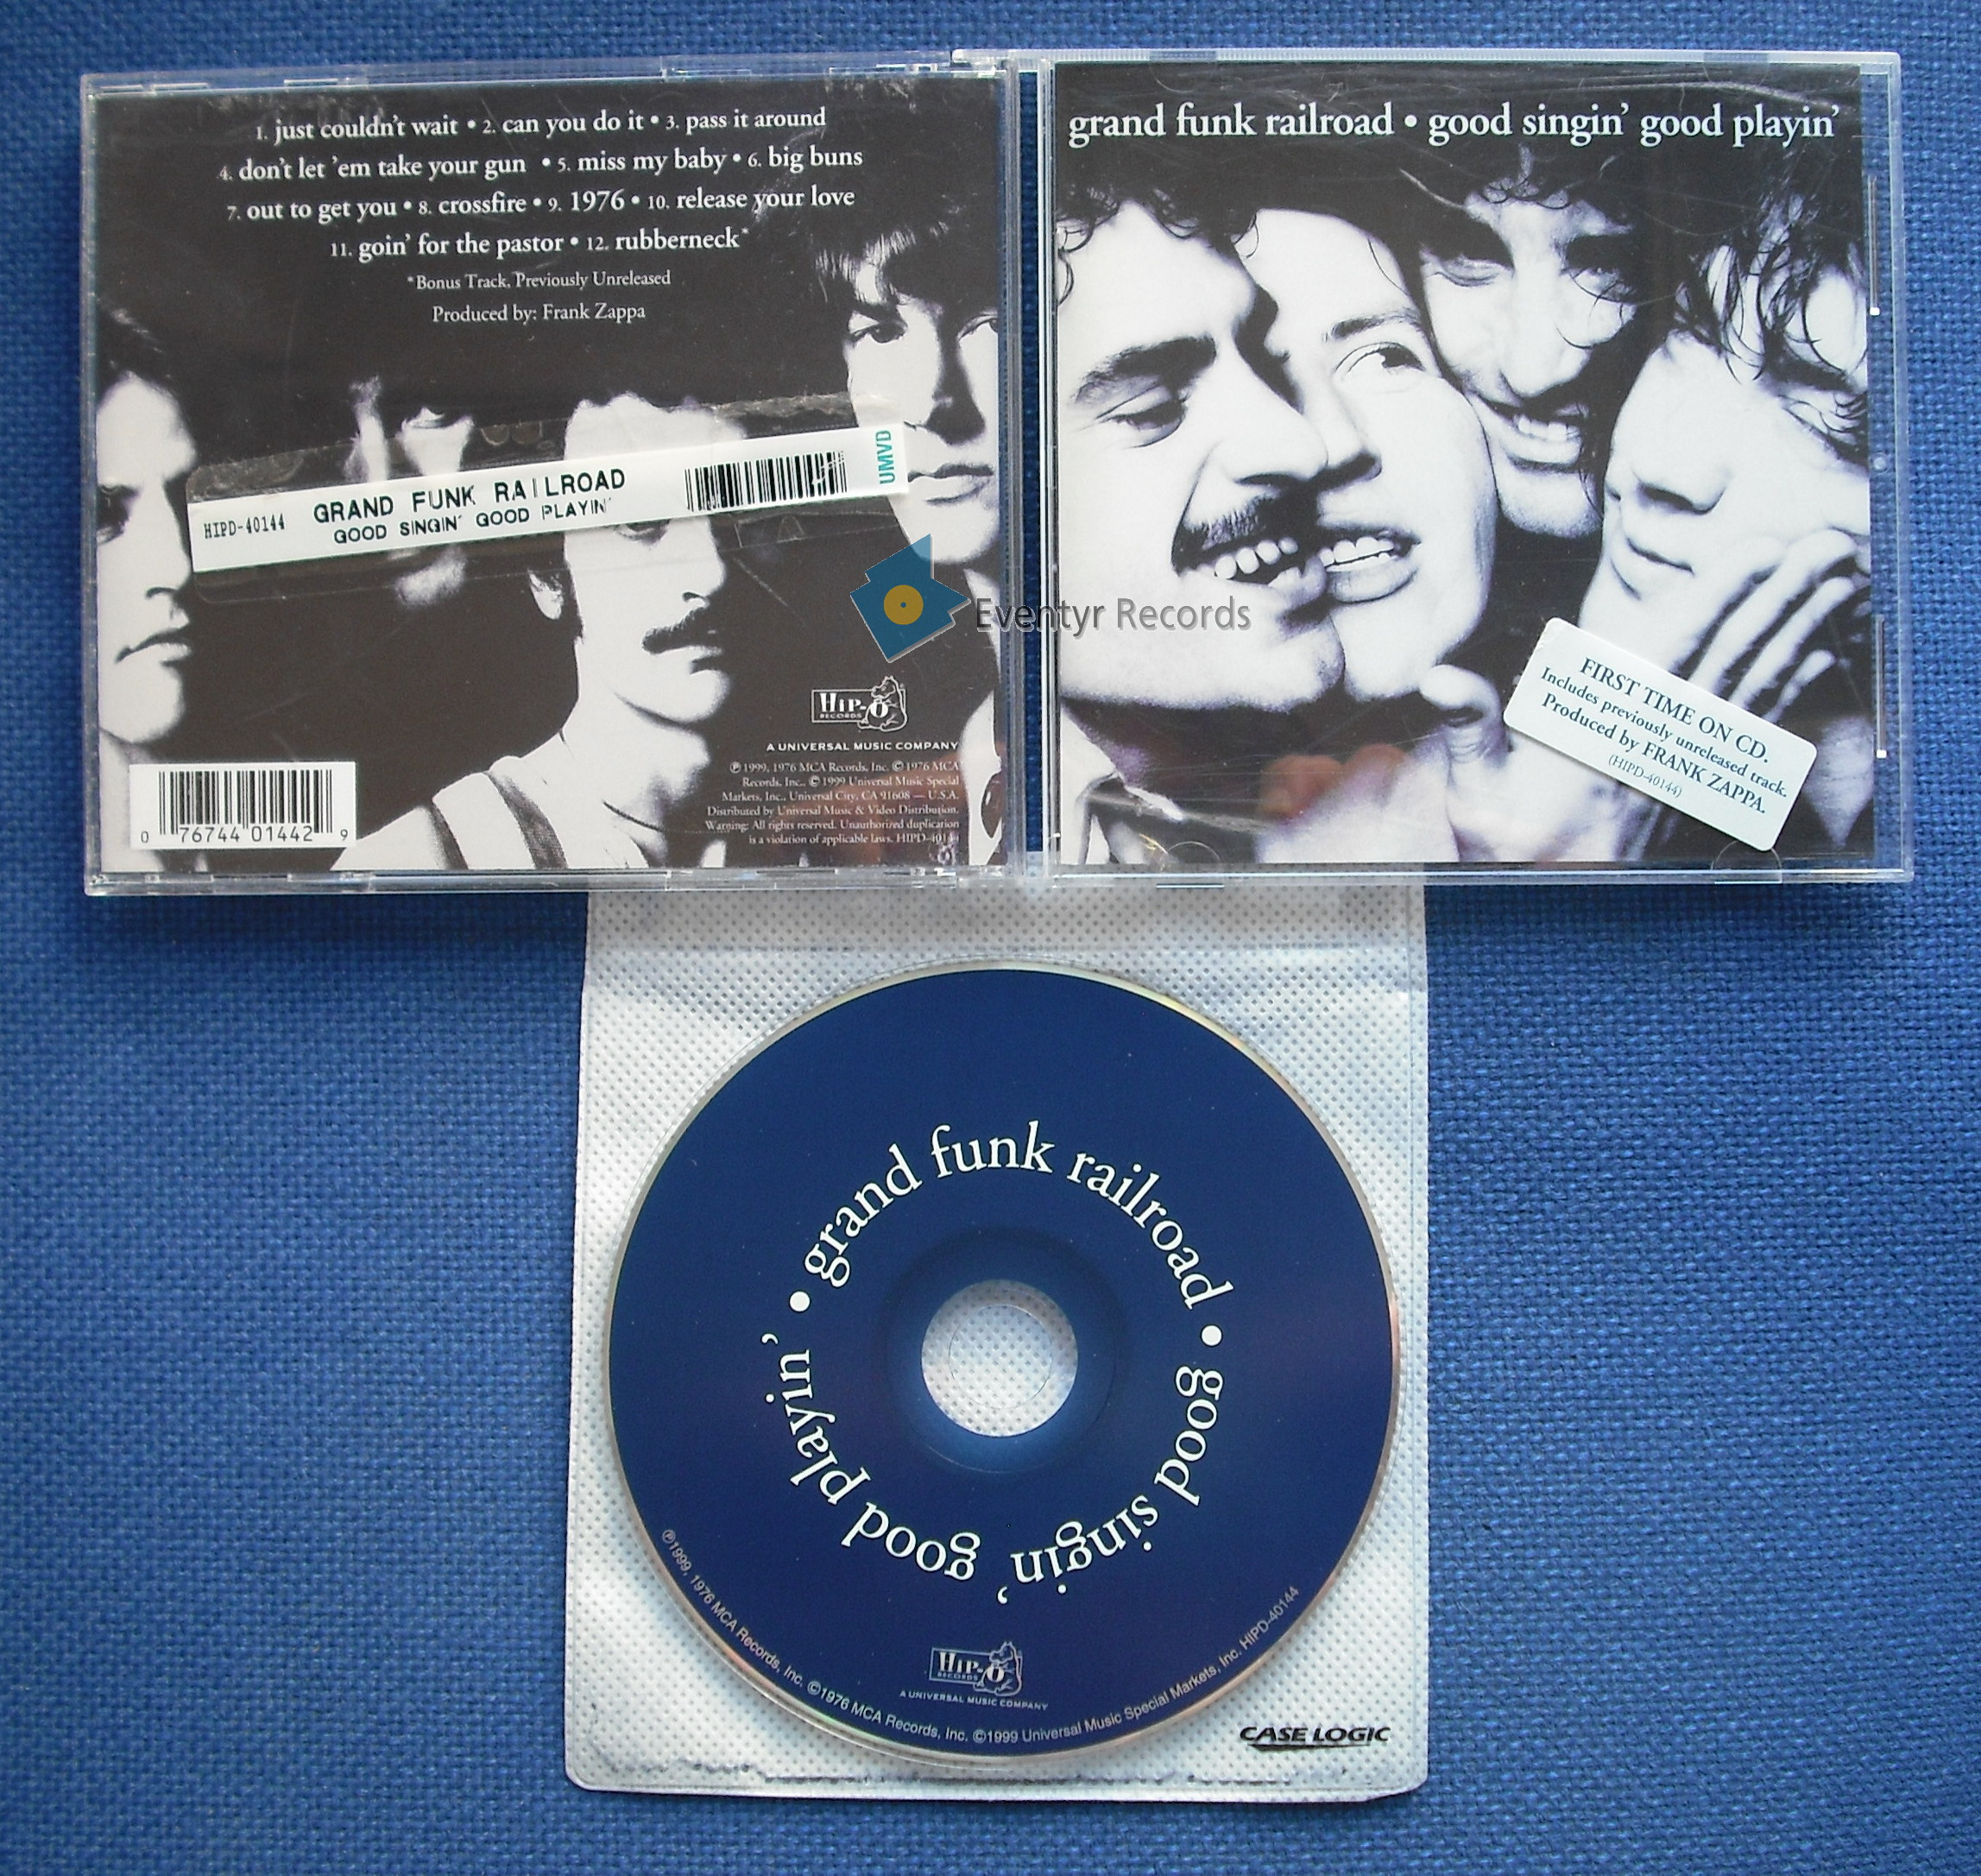 Grand Funk Railroad - Good Singin' Good Playin' (used)